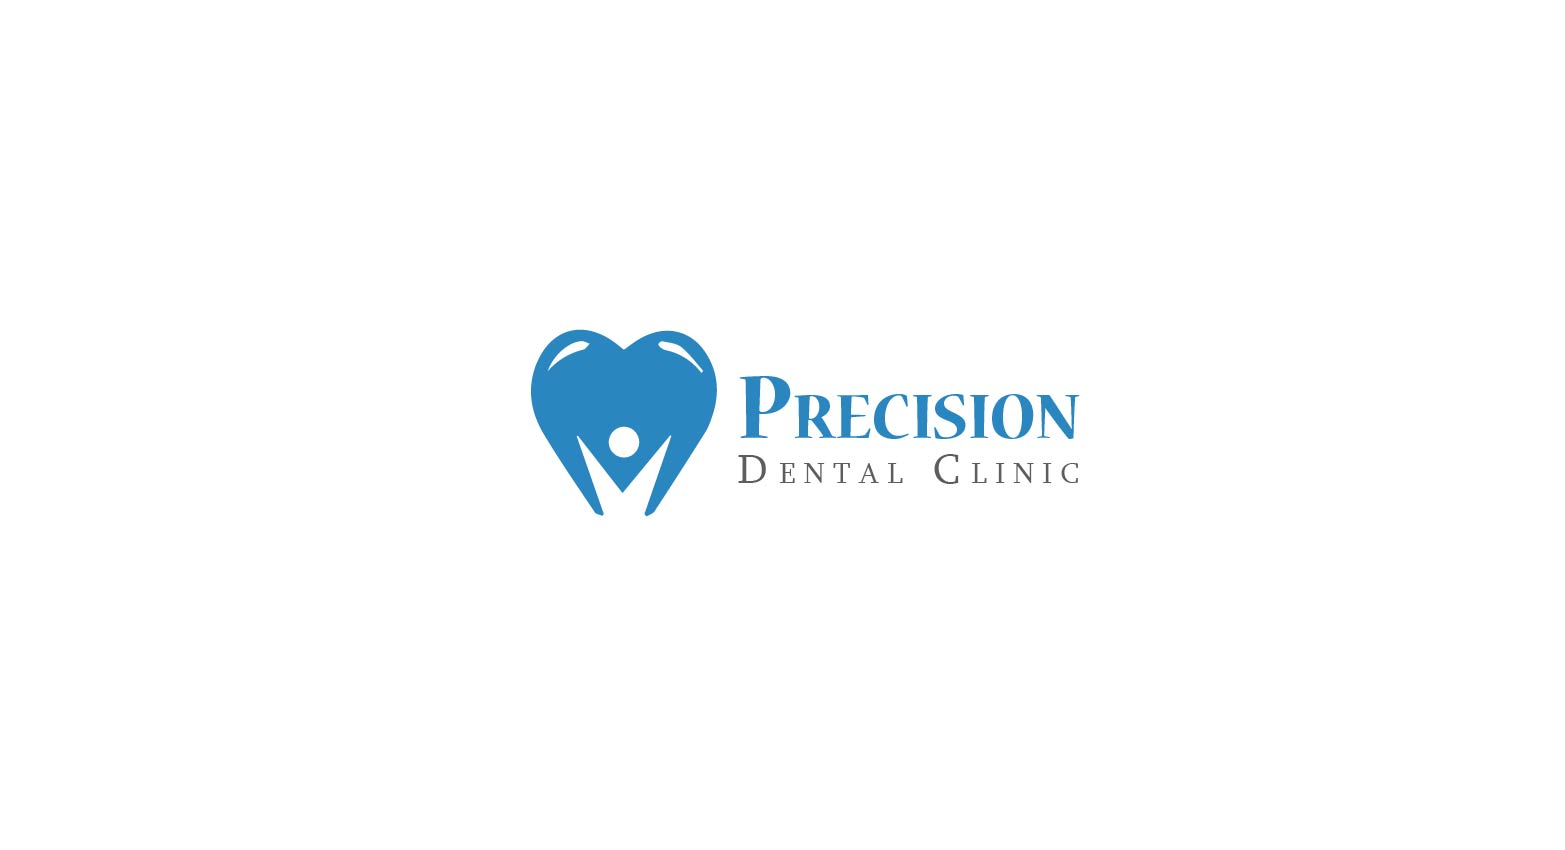 Logo Design by Muazzama Memon - Entry No. 167 in the Logo Design Contest Captivating Logo Design for Precision Dental Clinic.